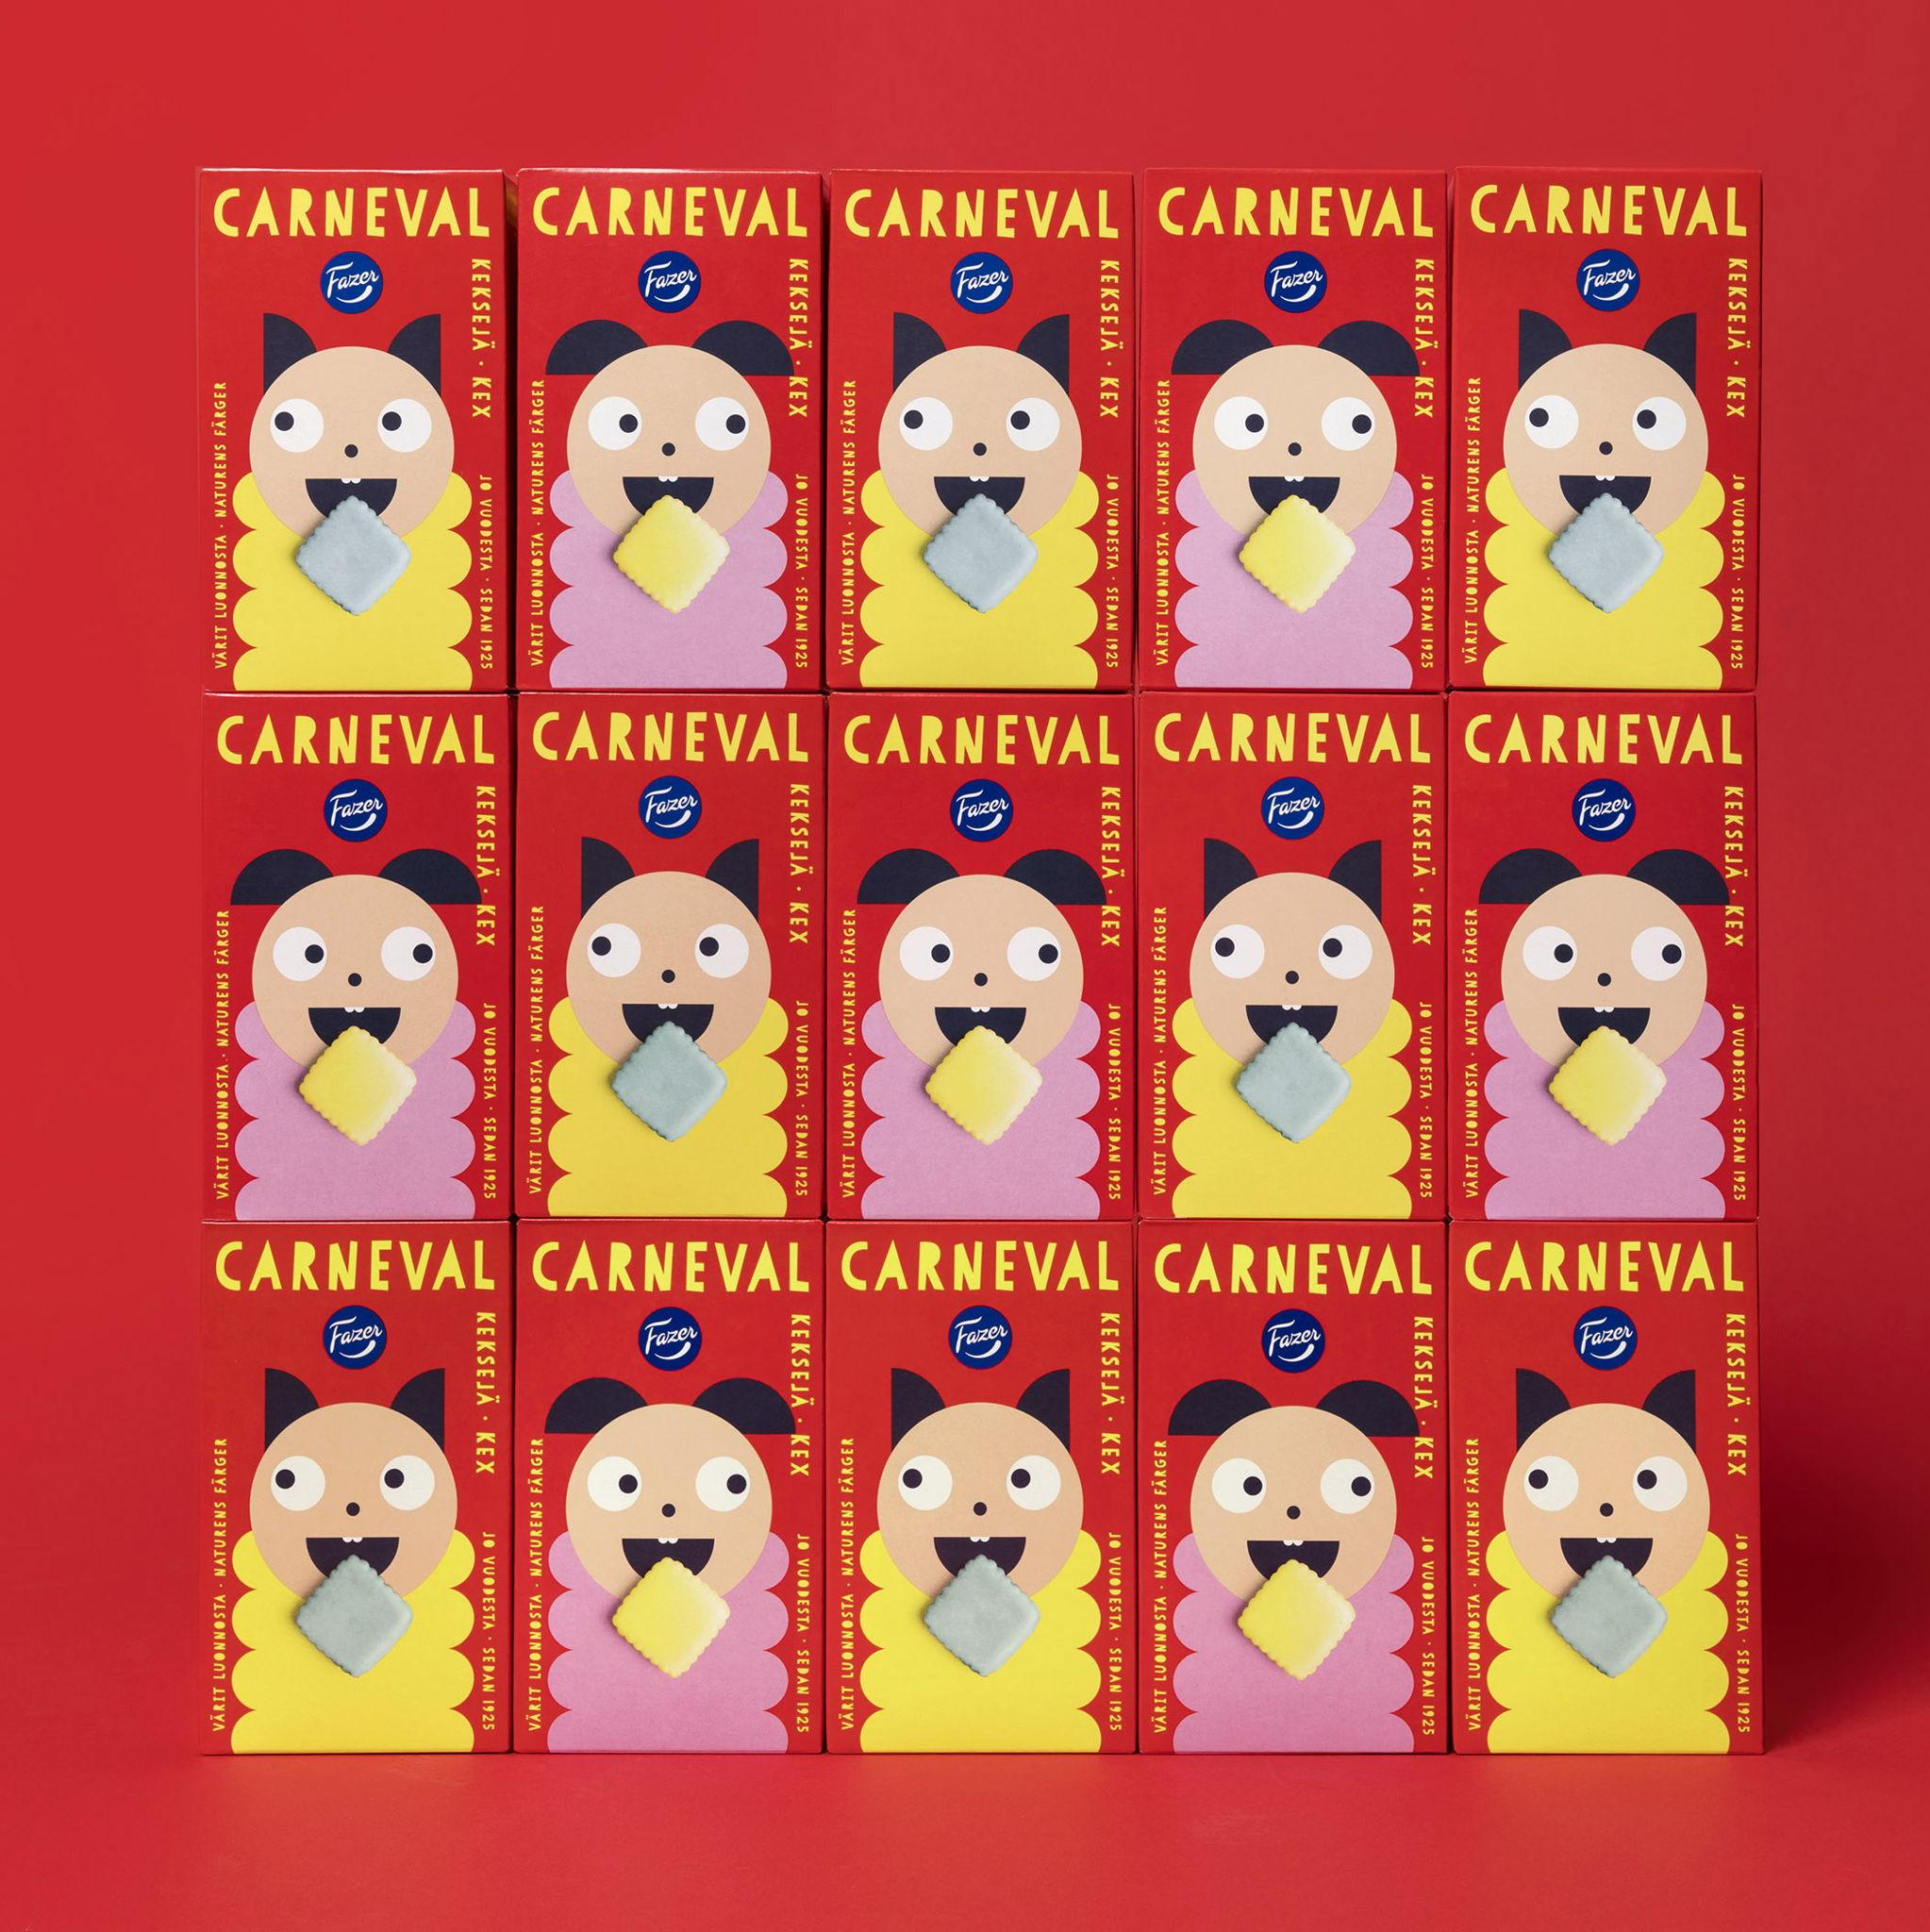 8_Kuudes_Fazer_Carneval_Listing.jpg